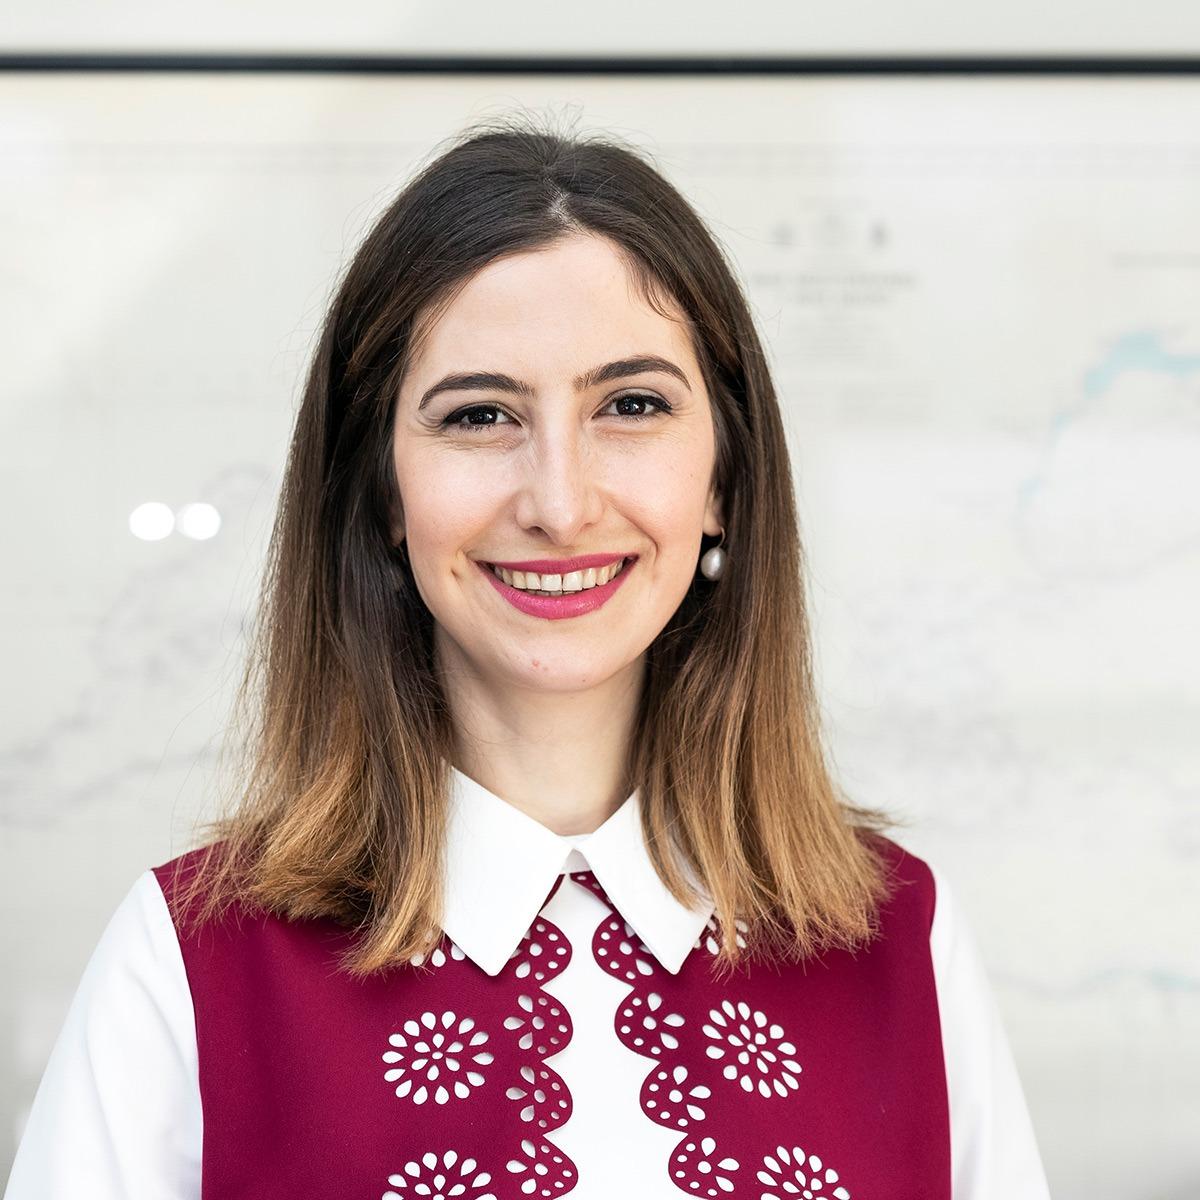 Karina Melkonian